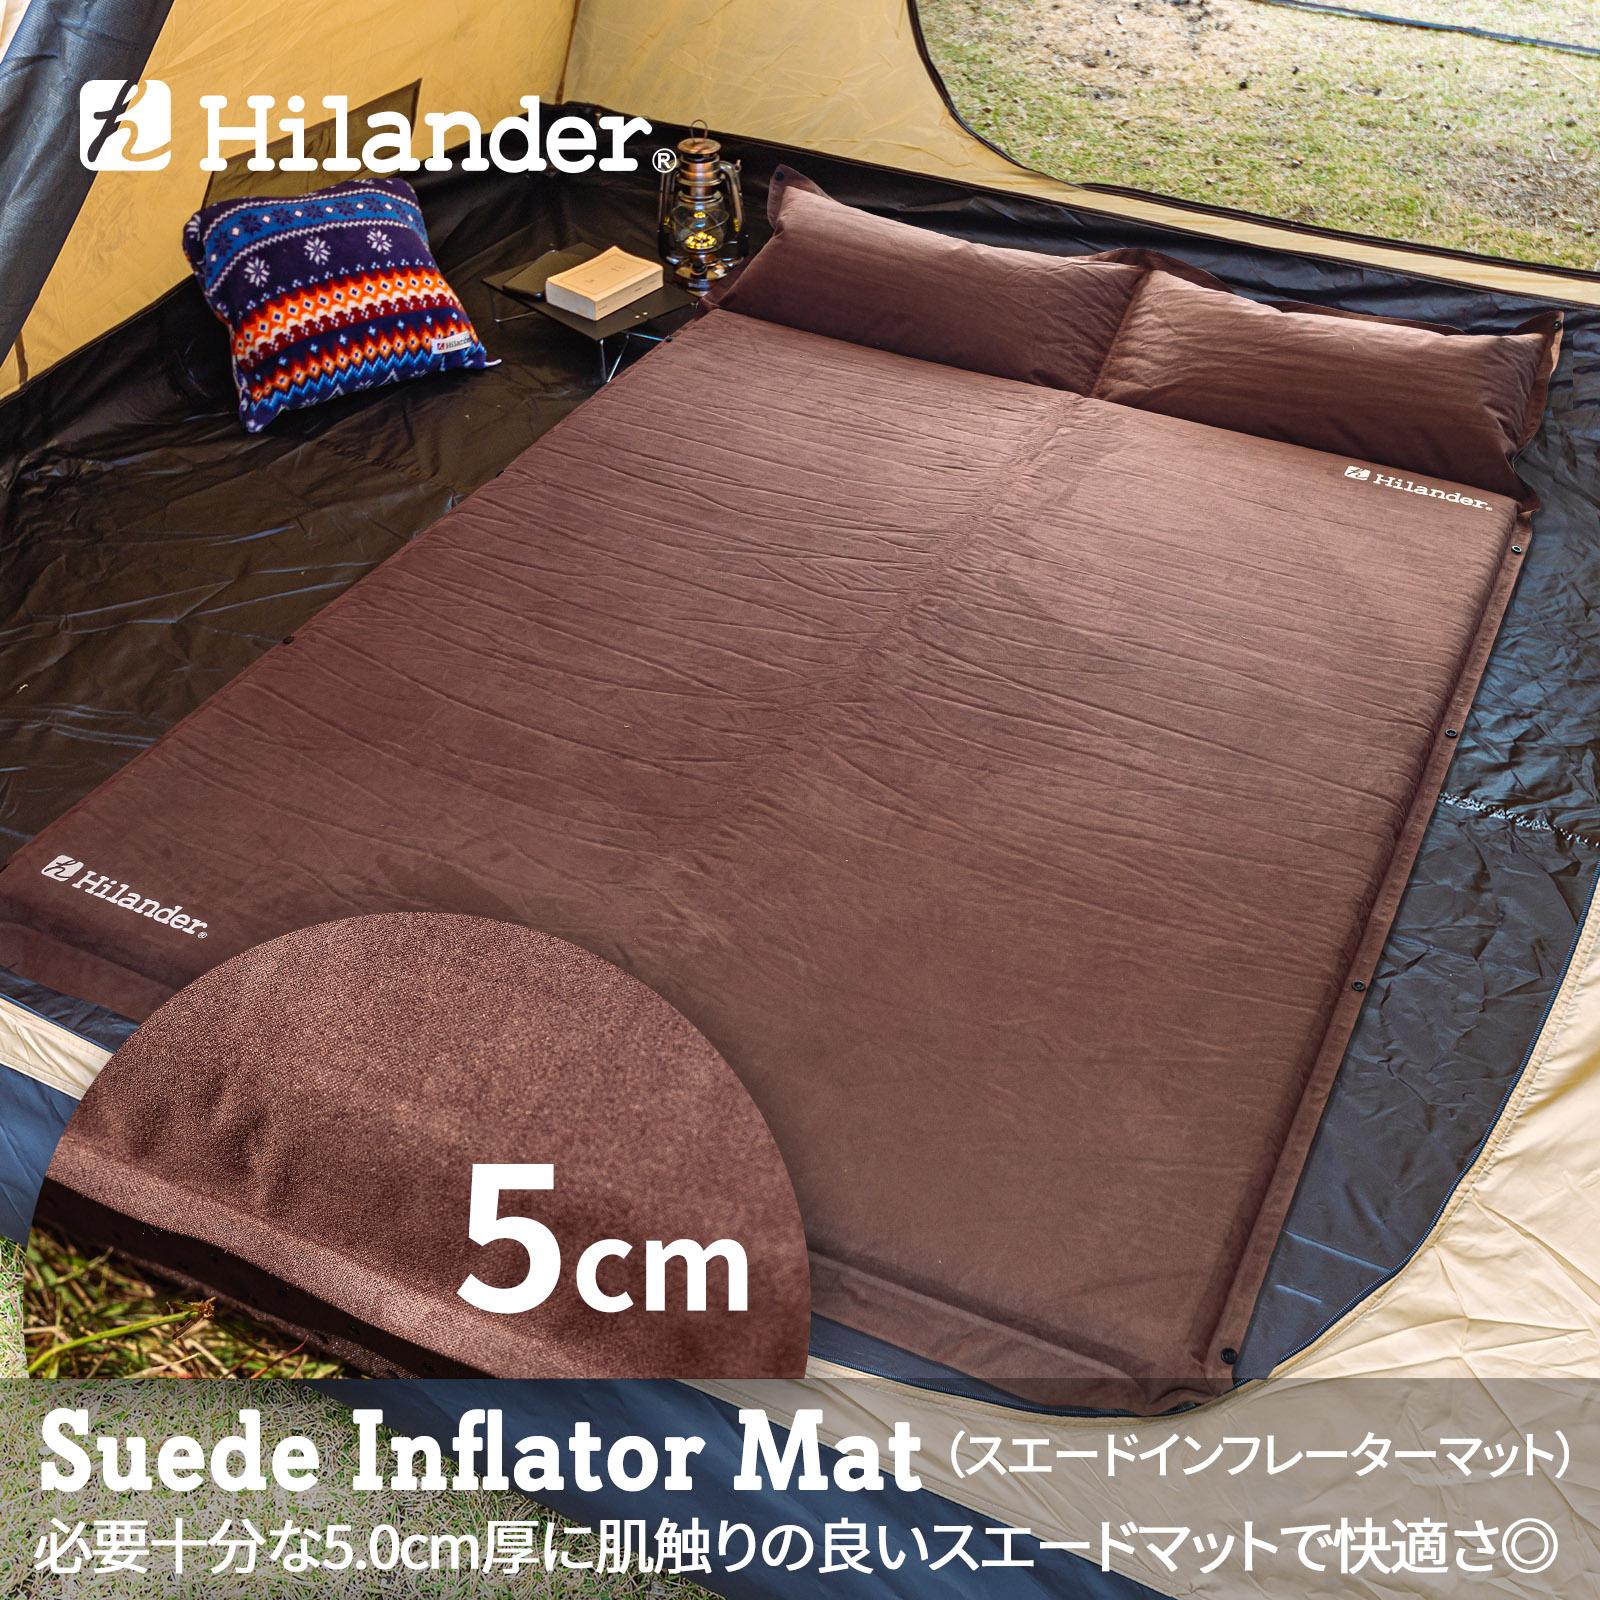 Hilander(ハイランダー) スエードインフレーターマット(枕付きタイプ) 5.0cm ダブル ブラウン UK-3